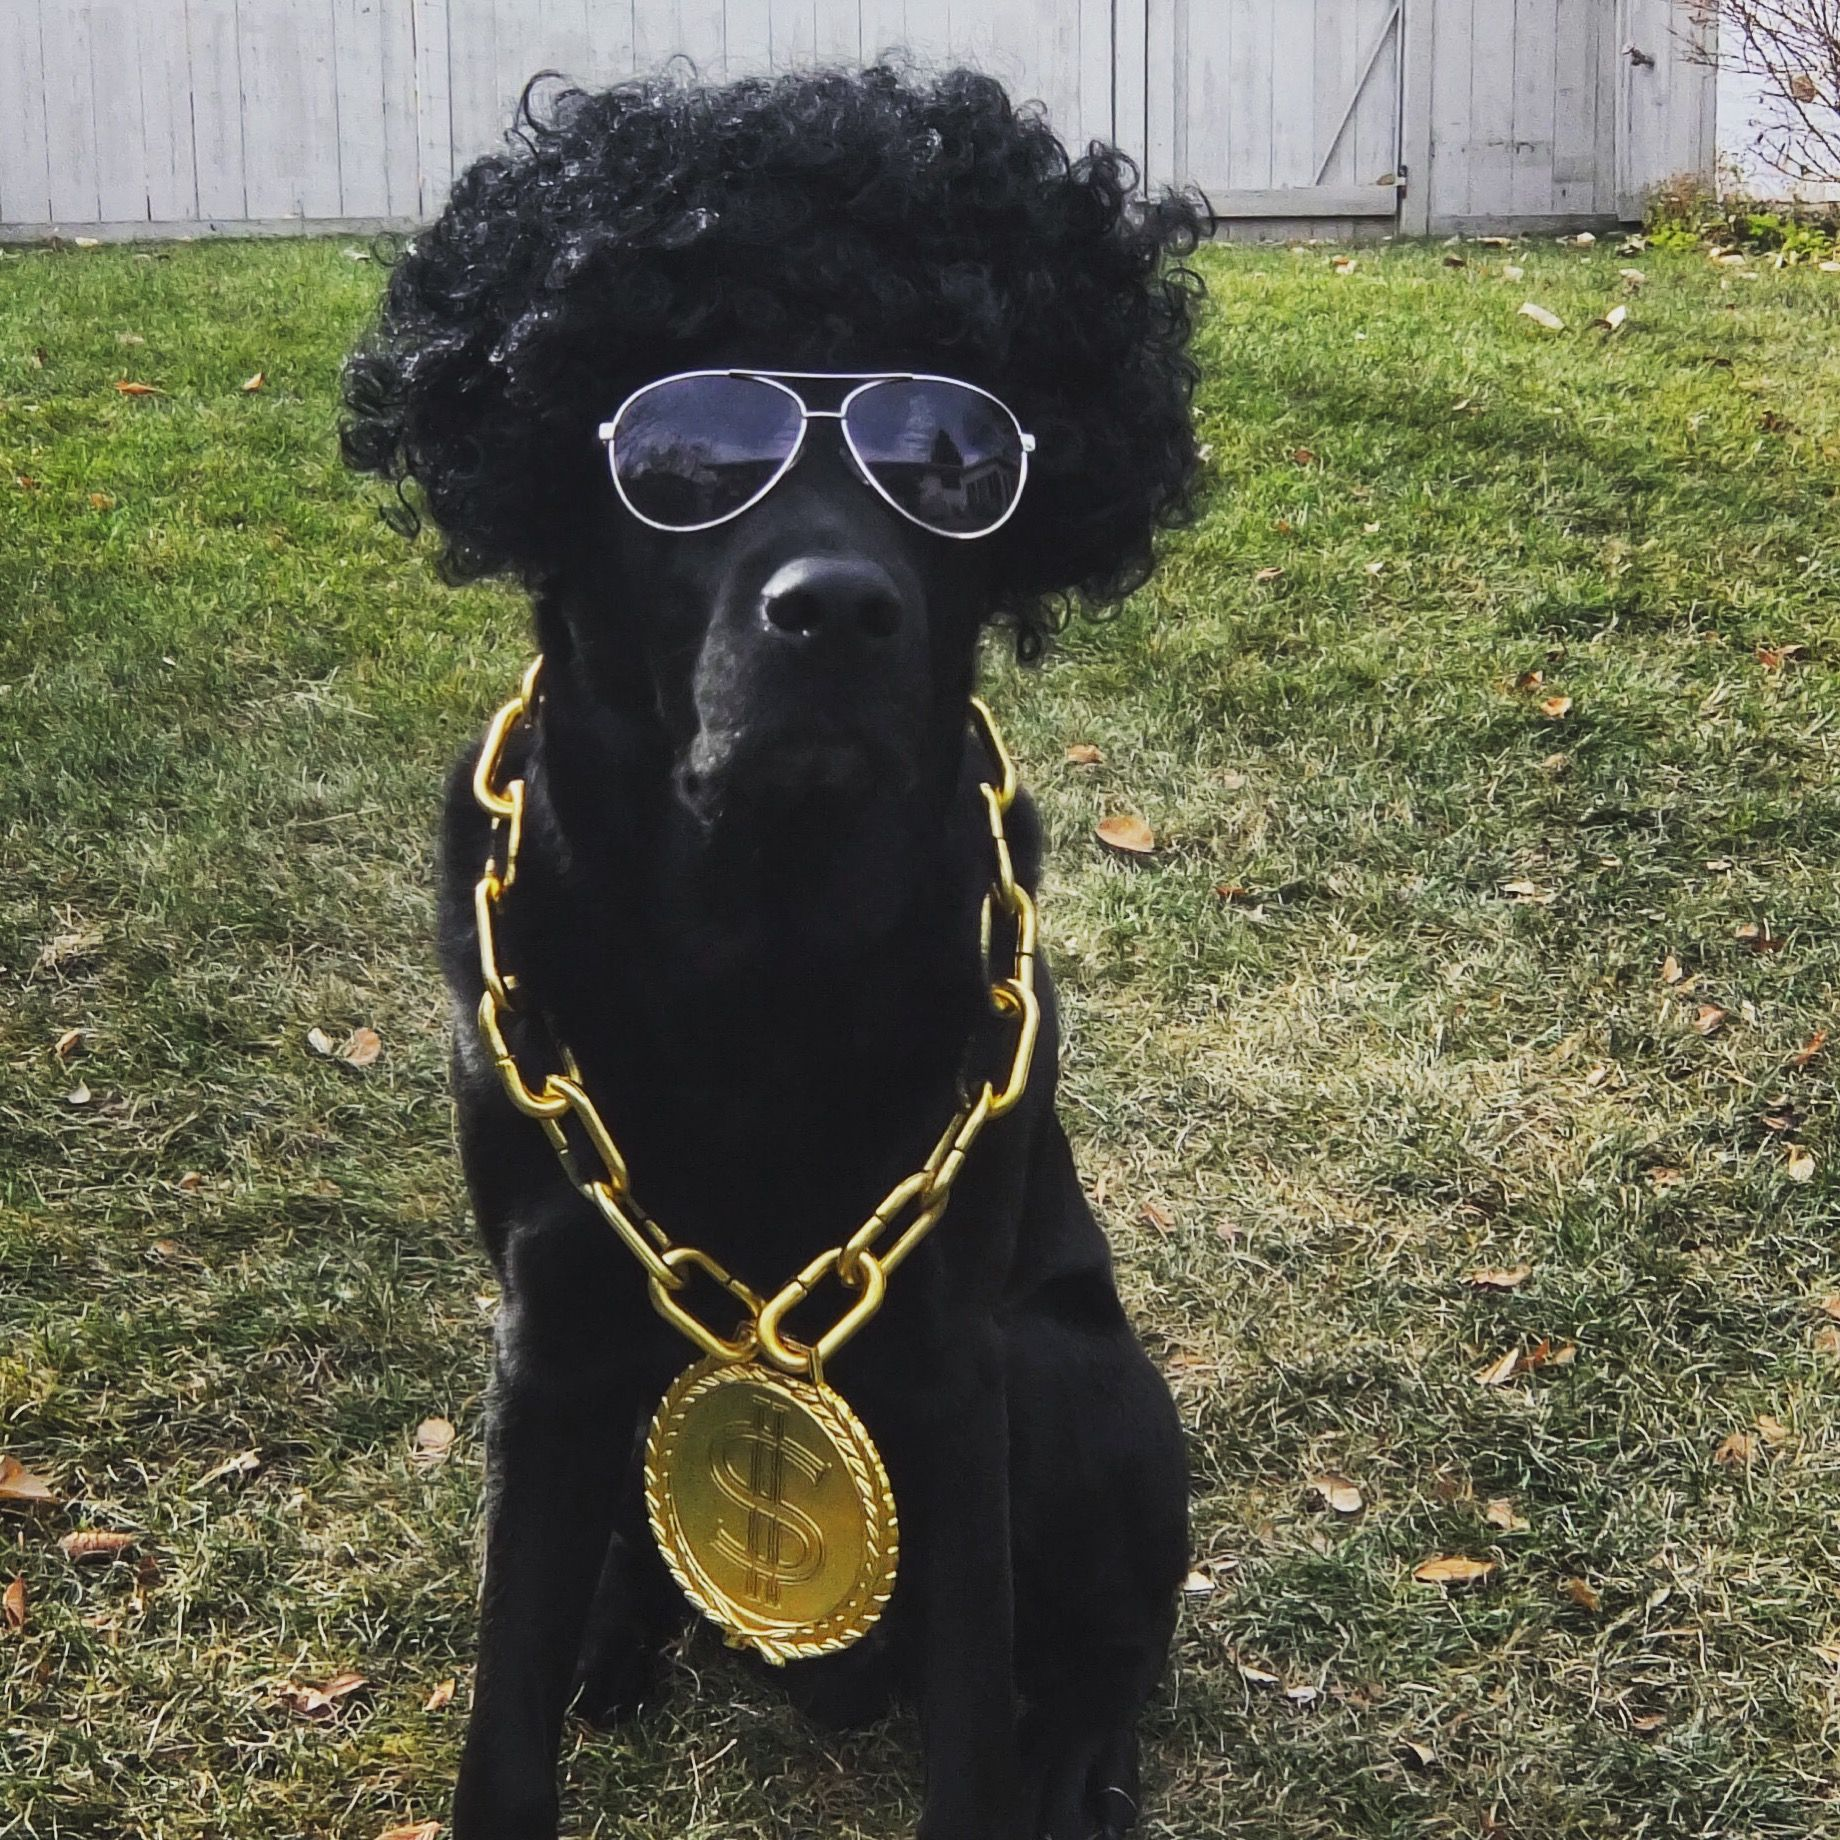 Dog Halloween costume. Rapper. Mix tape. Money chain. Cute